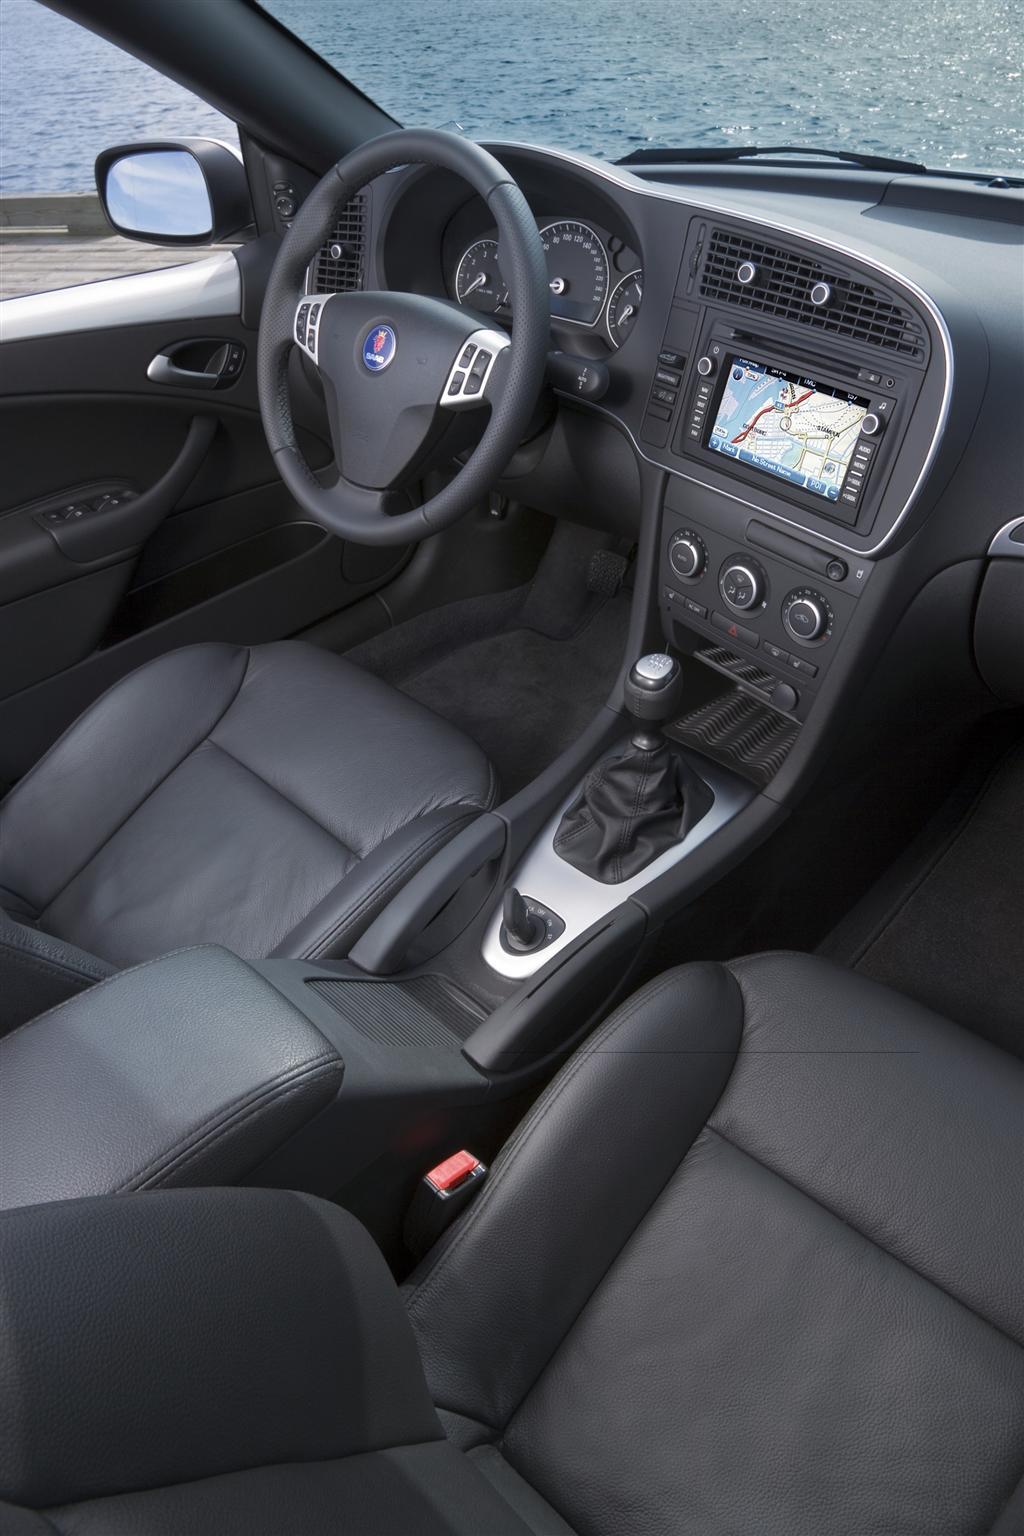 2009 saab 9 3 news and information conceptcarz com rh conceptcarz com Saab 9-3 Interior Saab 9-3 Interior